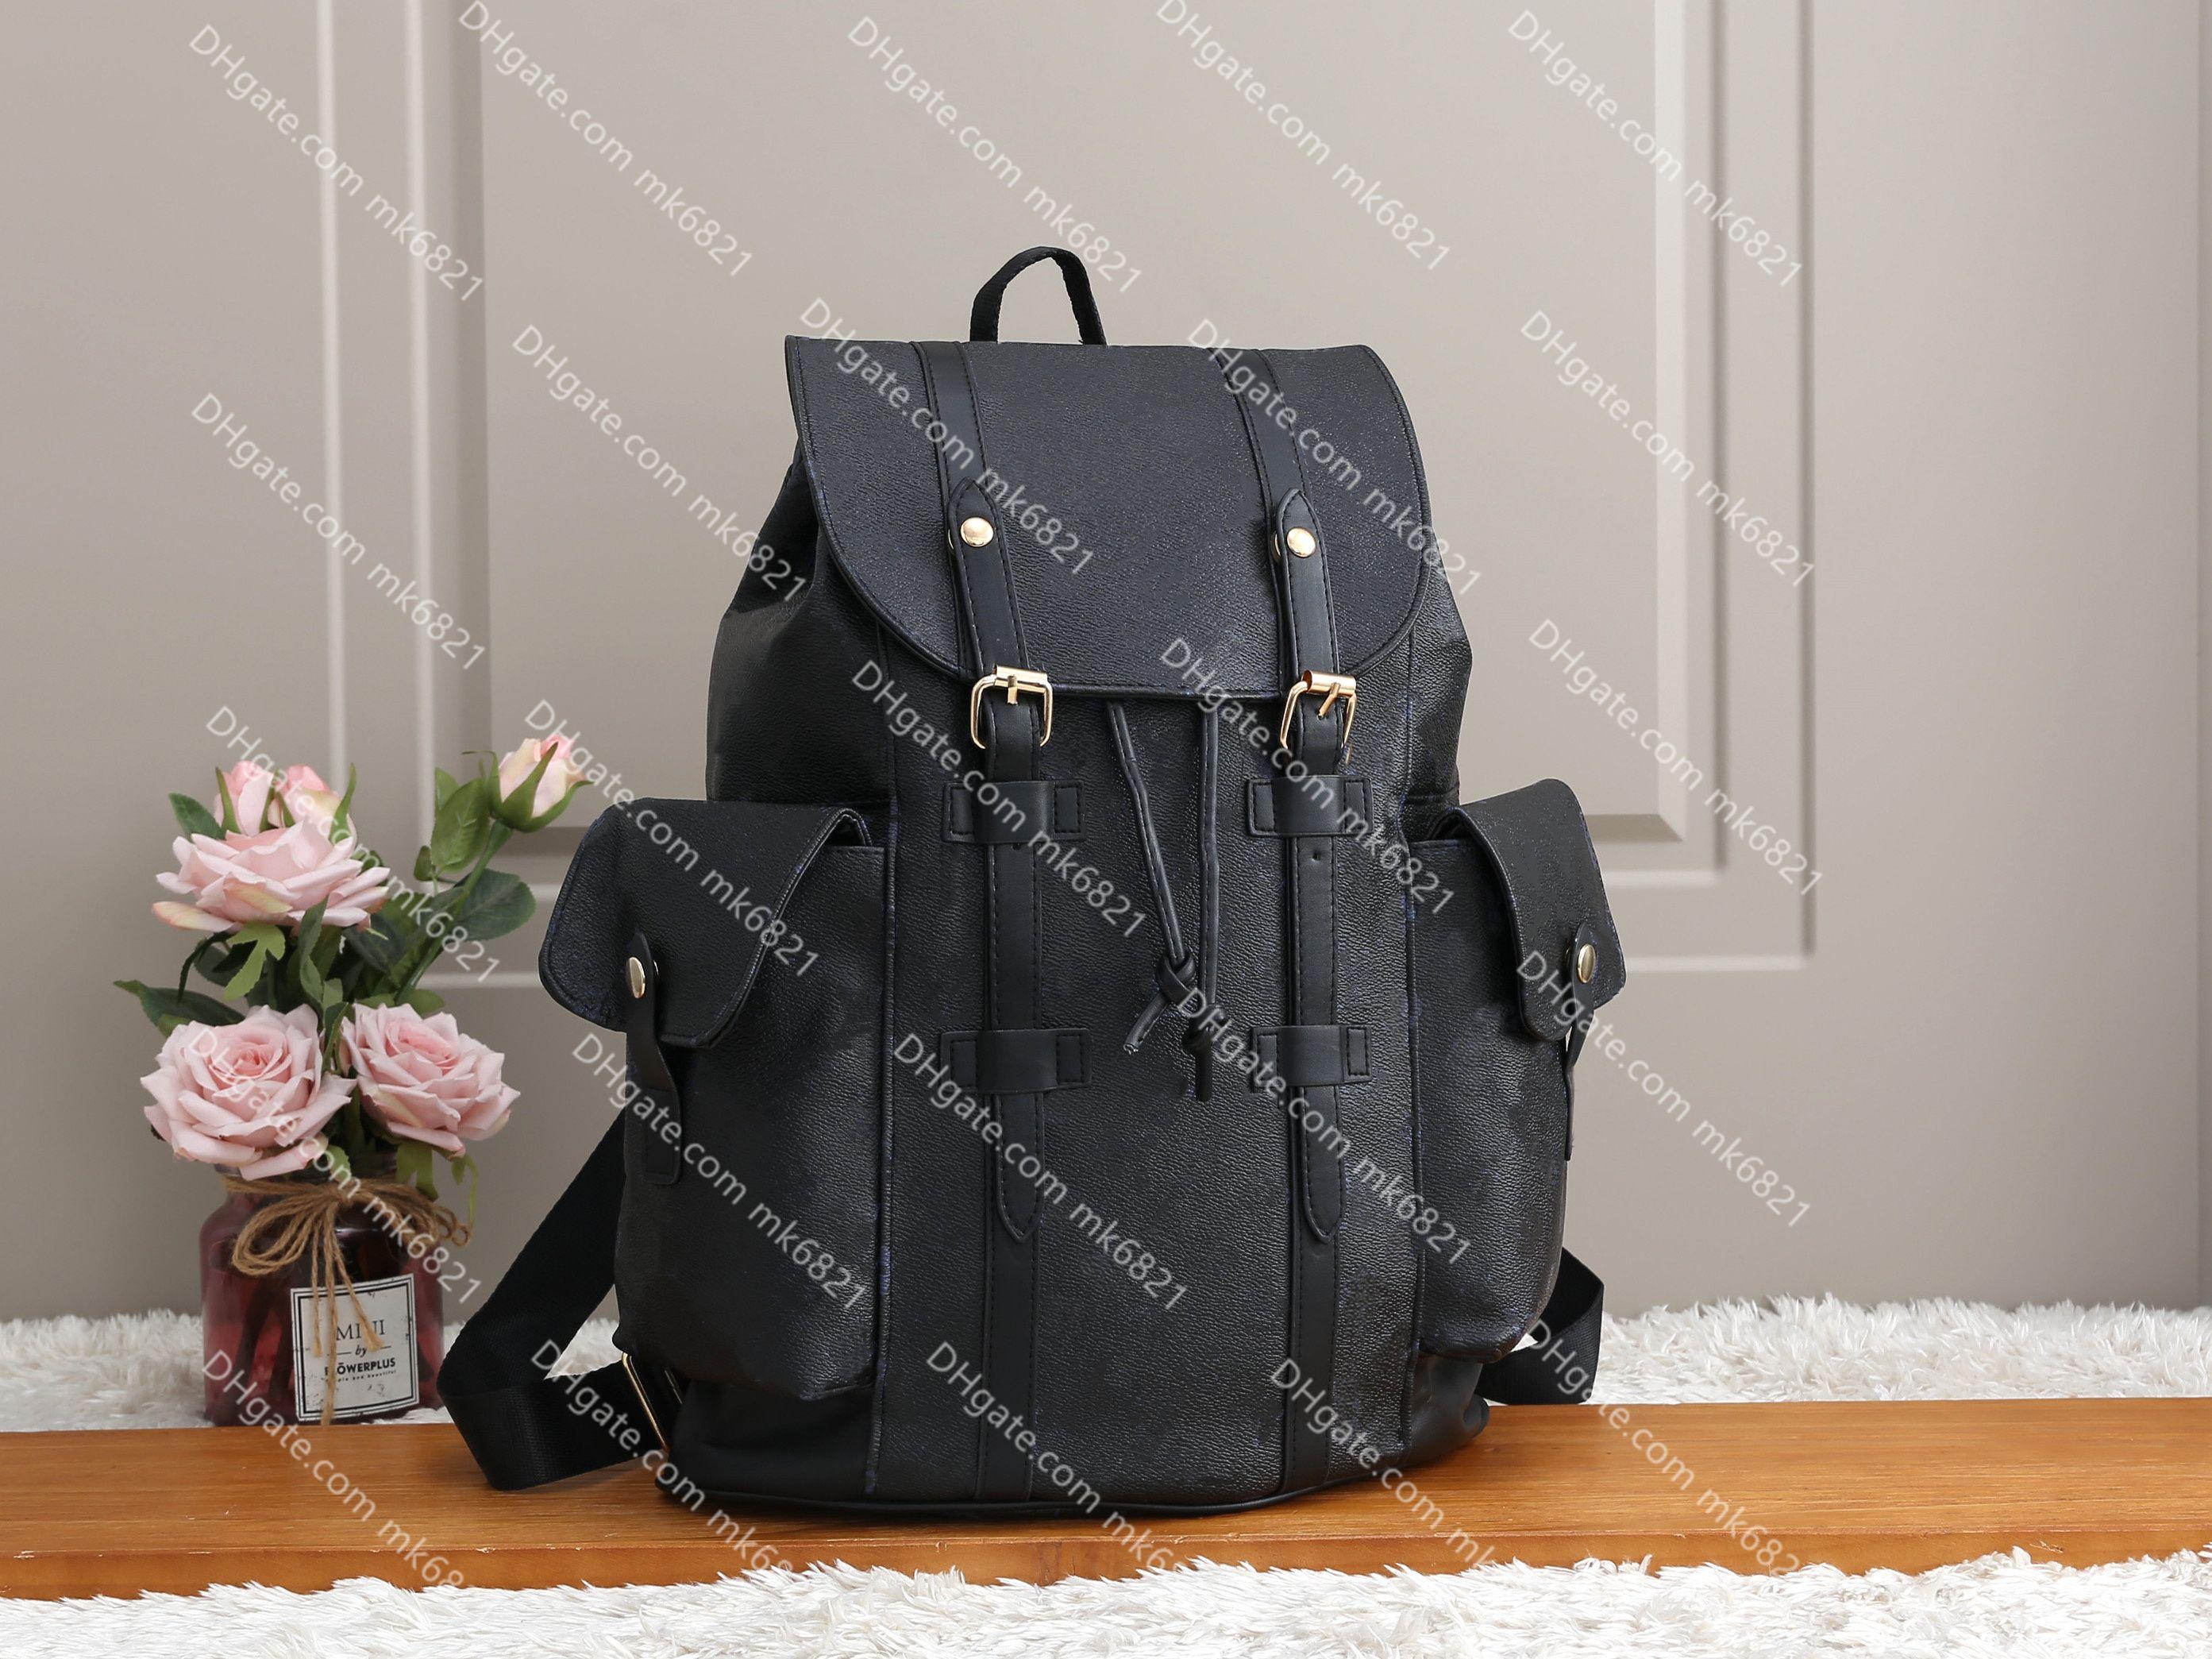 High Christopher Bags Luxurys Calidad Hombres Escuela Mochila Mochila Mochila Back Pack Satchel Designers Bag Moda Mujeres WCQRR